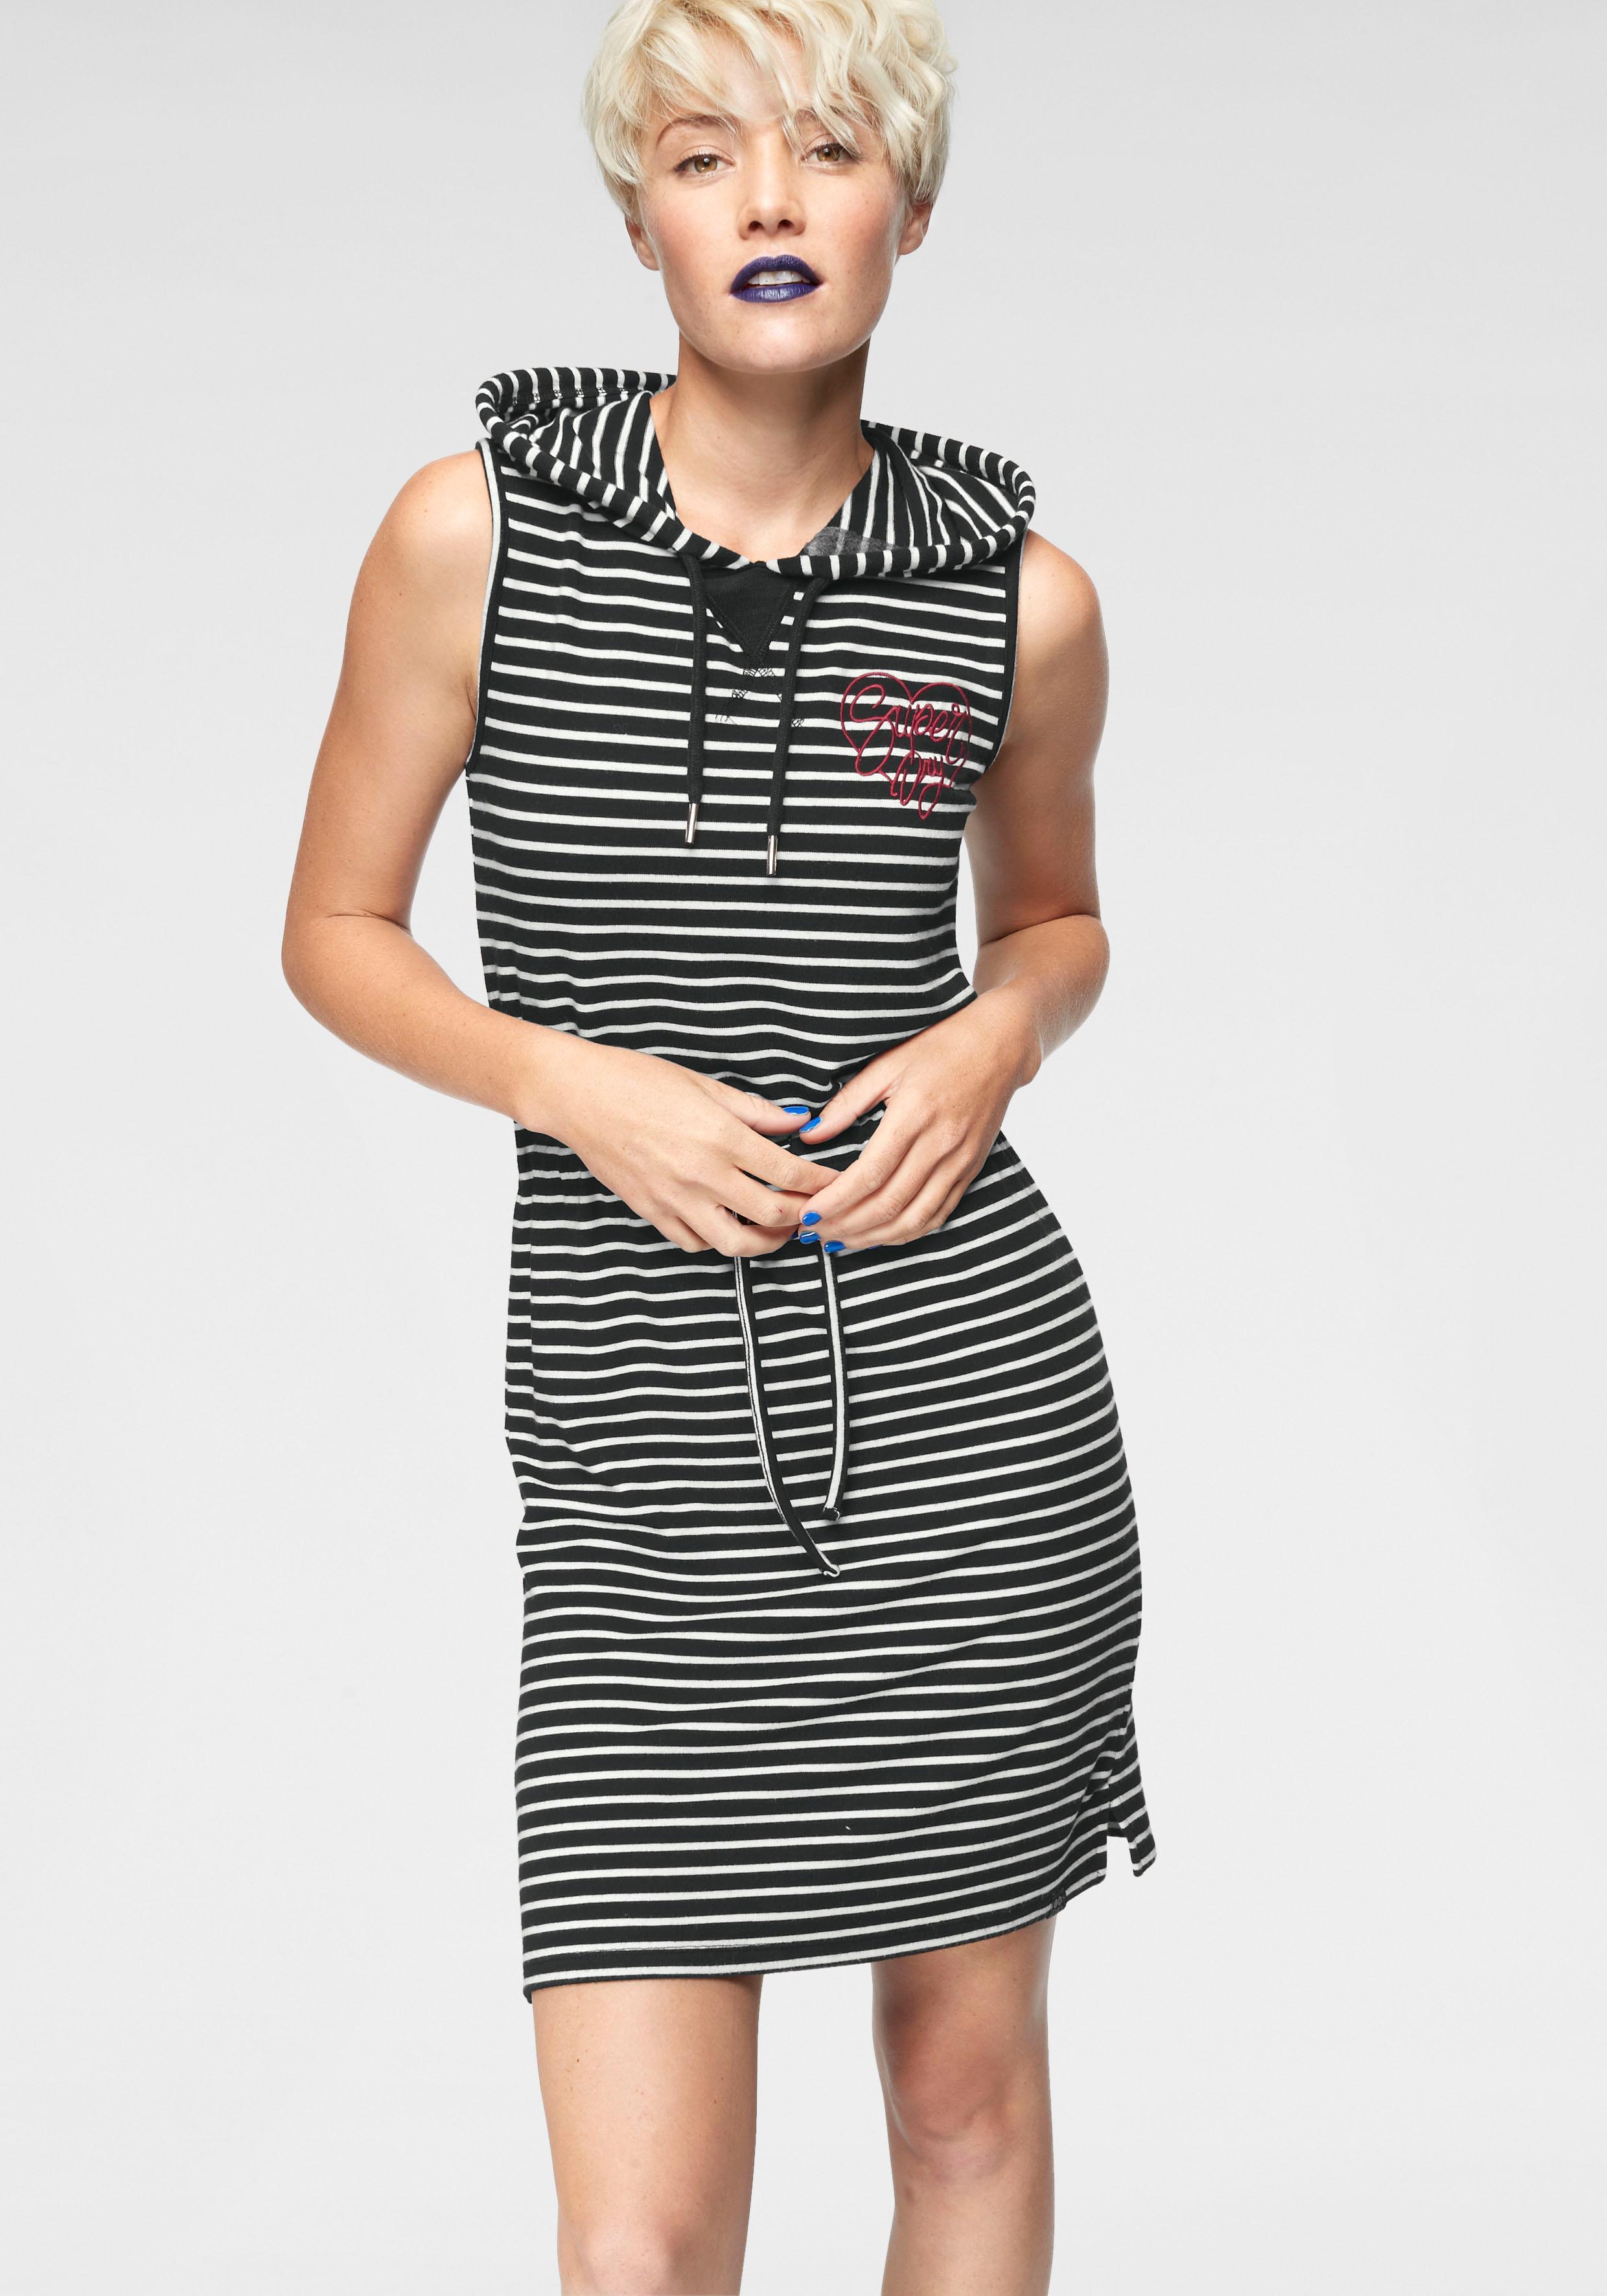 75c8253548f7 Superdry Jerseykleid BOUTIQUE SUPERSOFT DRESS